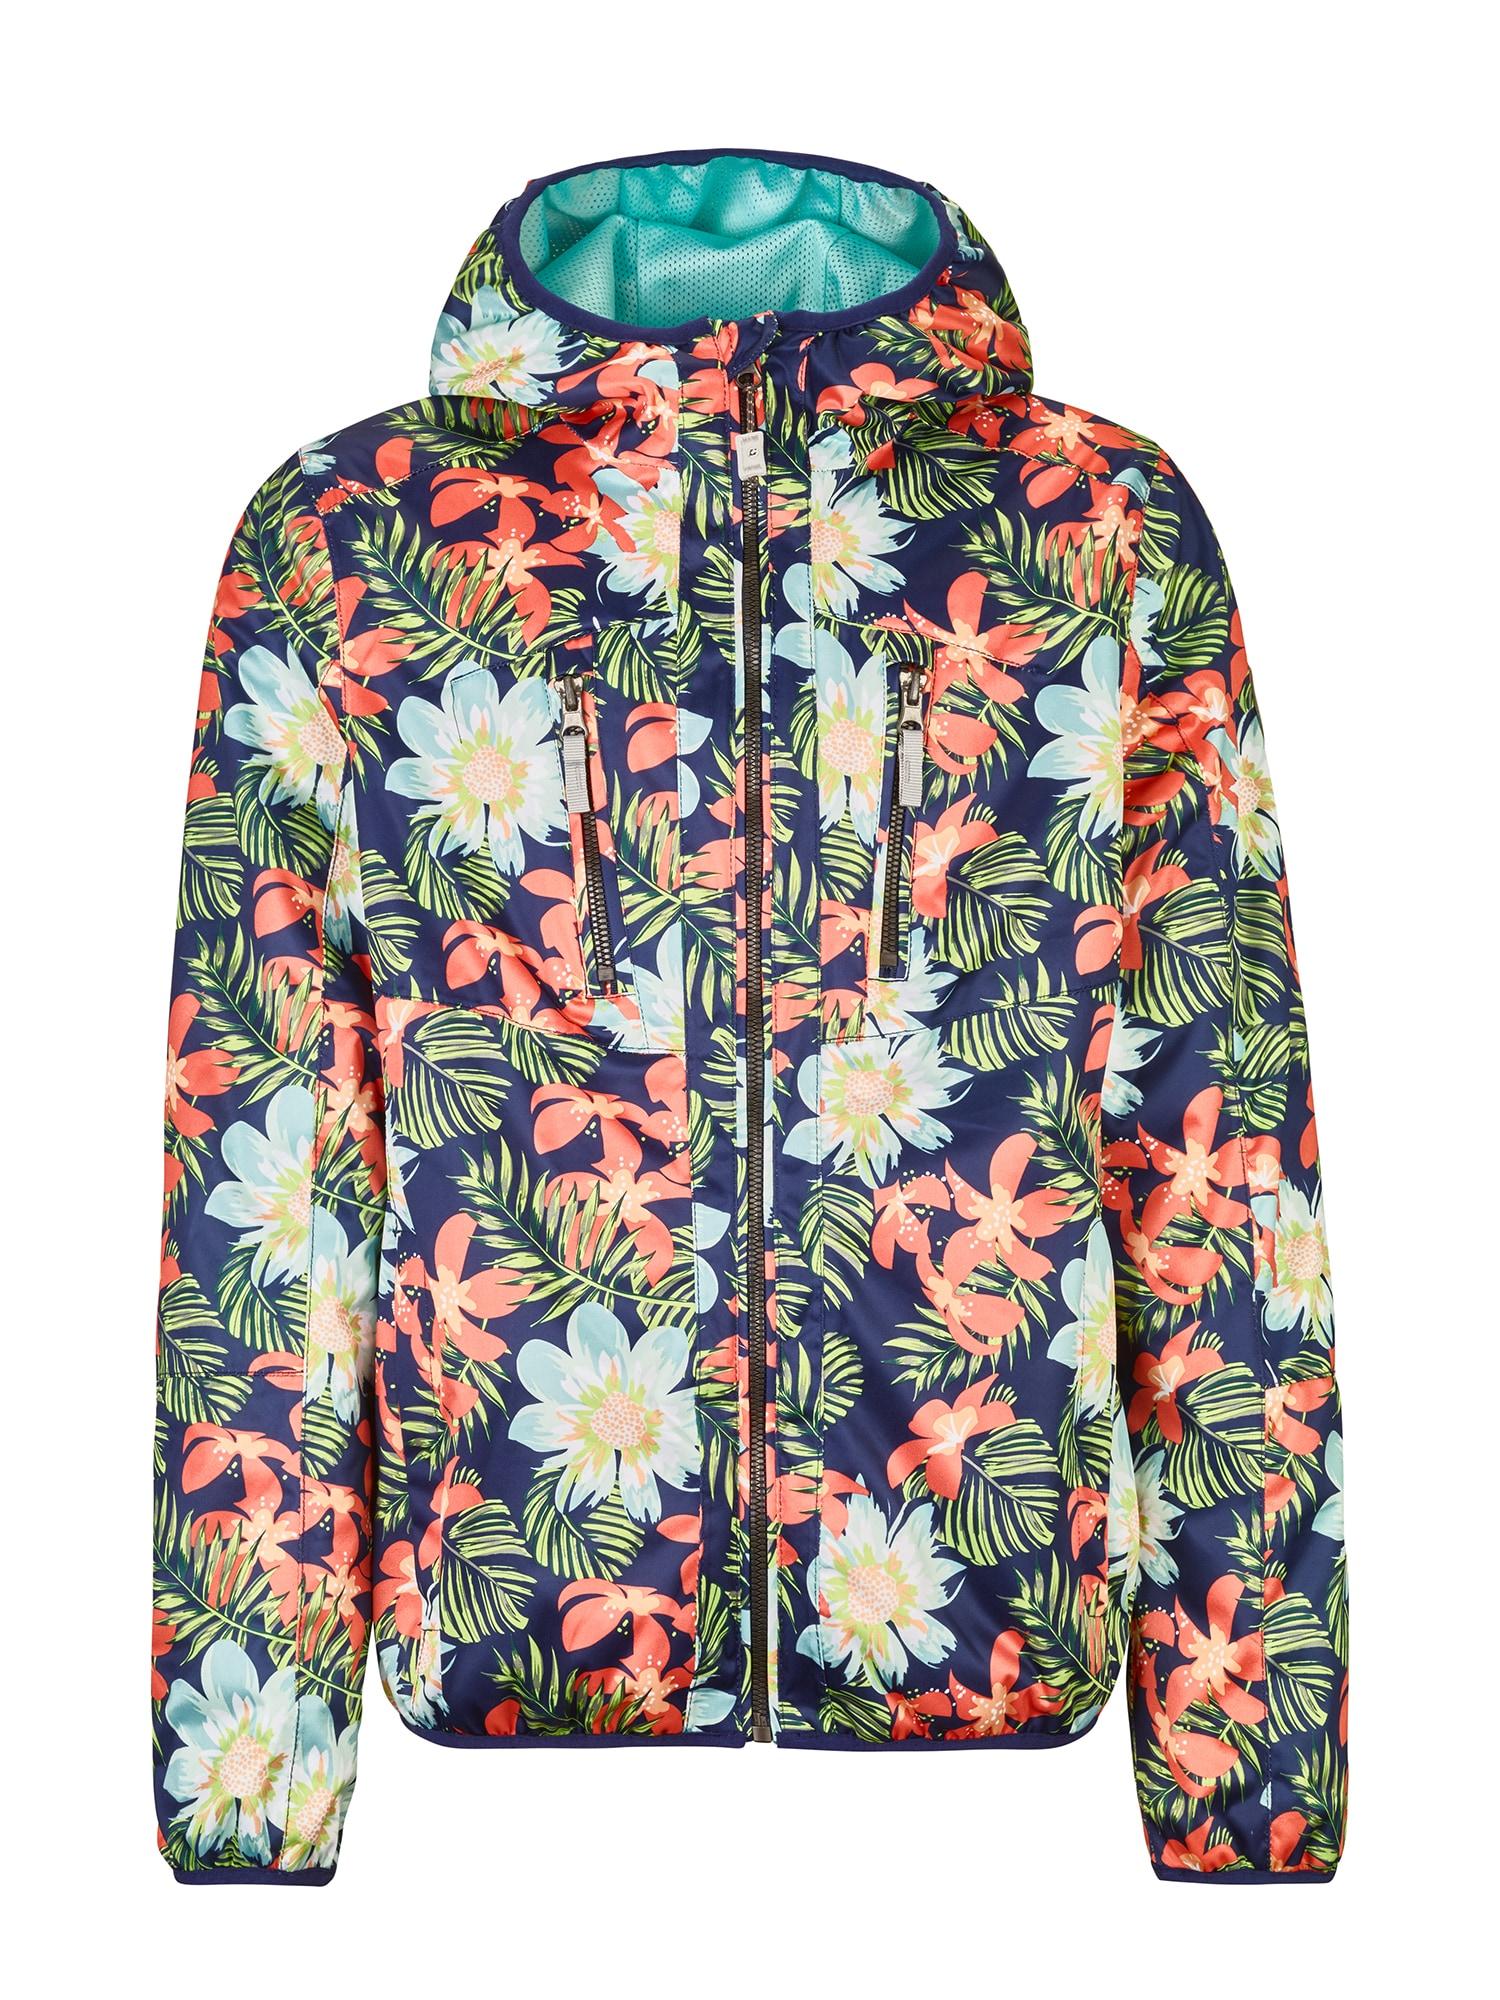 Outdoorová bunda tmavě modrá mix barev KILLTEC